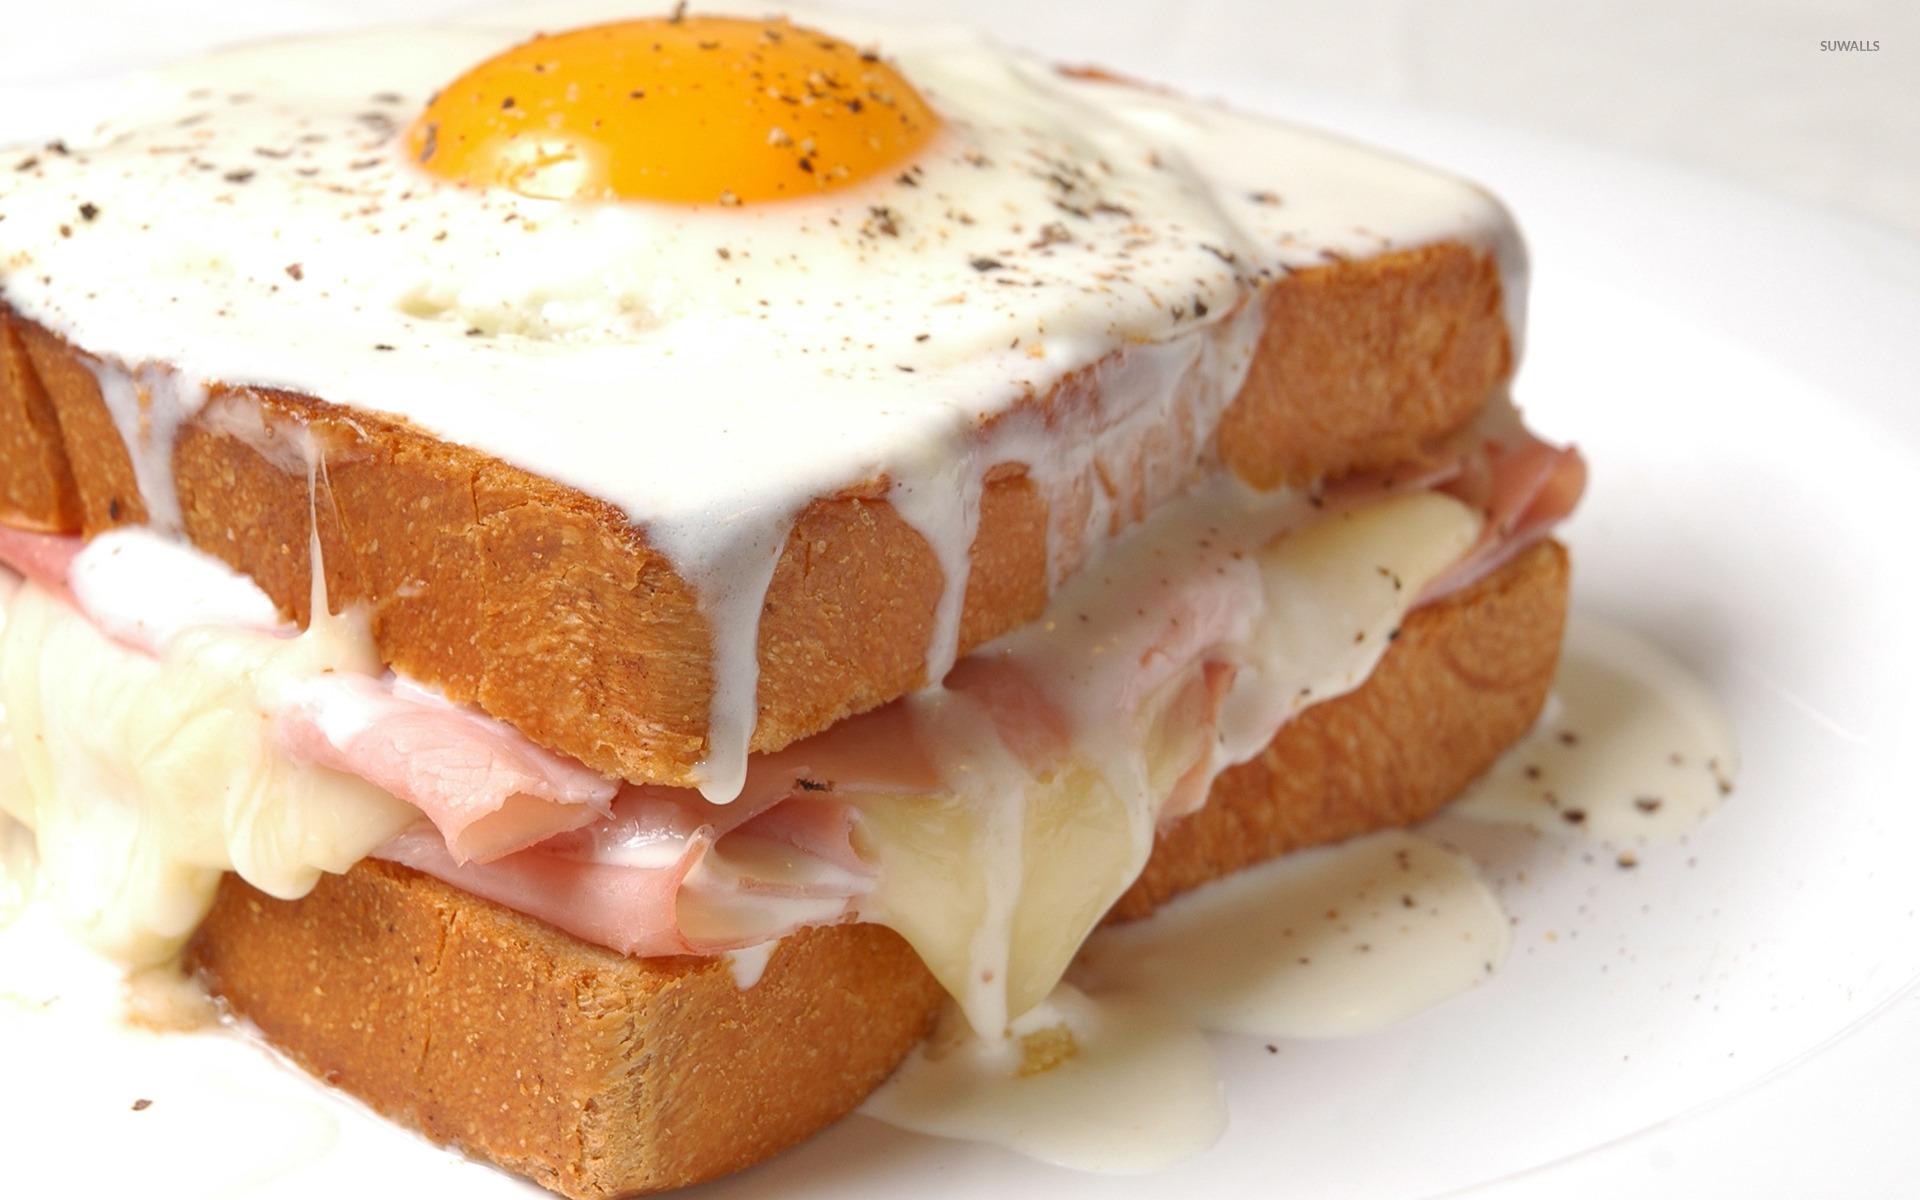 Fried egg sandwich wallpaper - Photography wallpapers - #32066